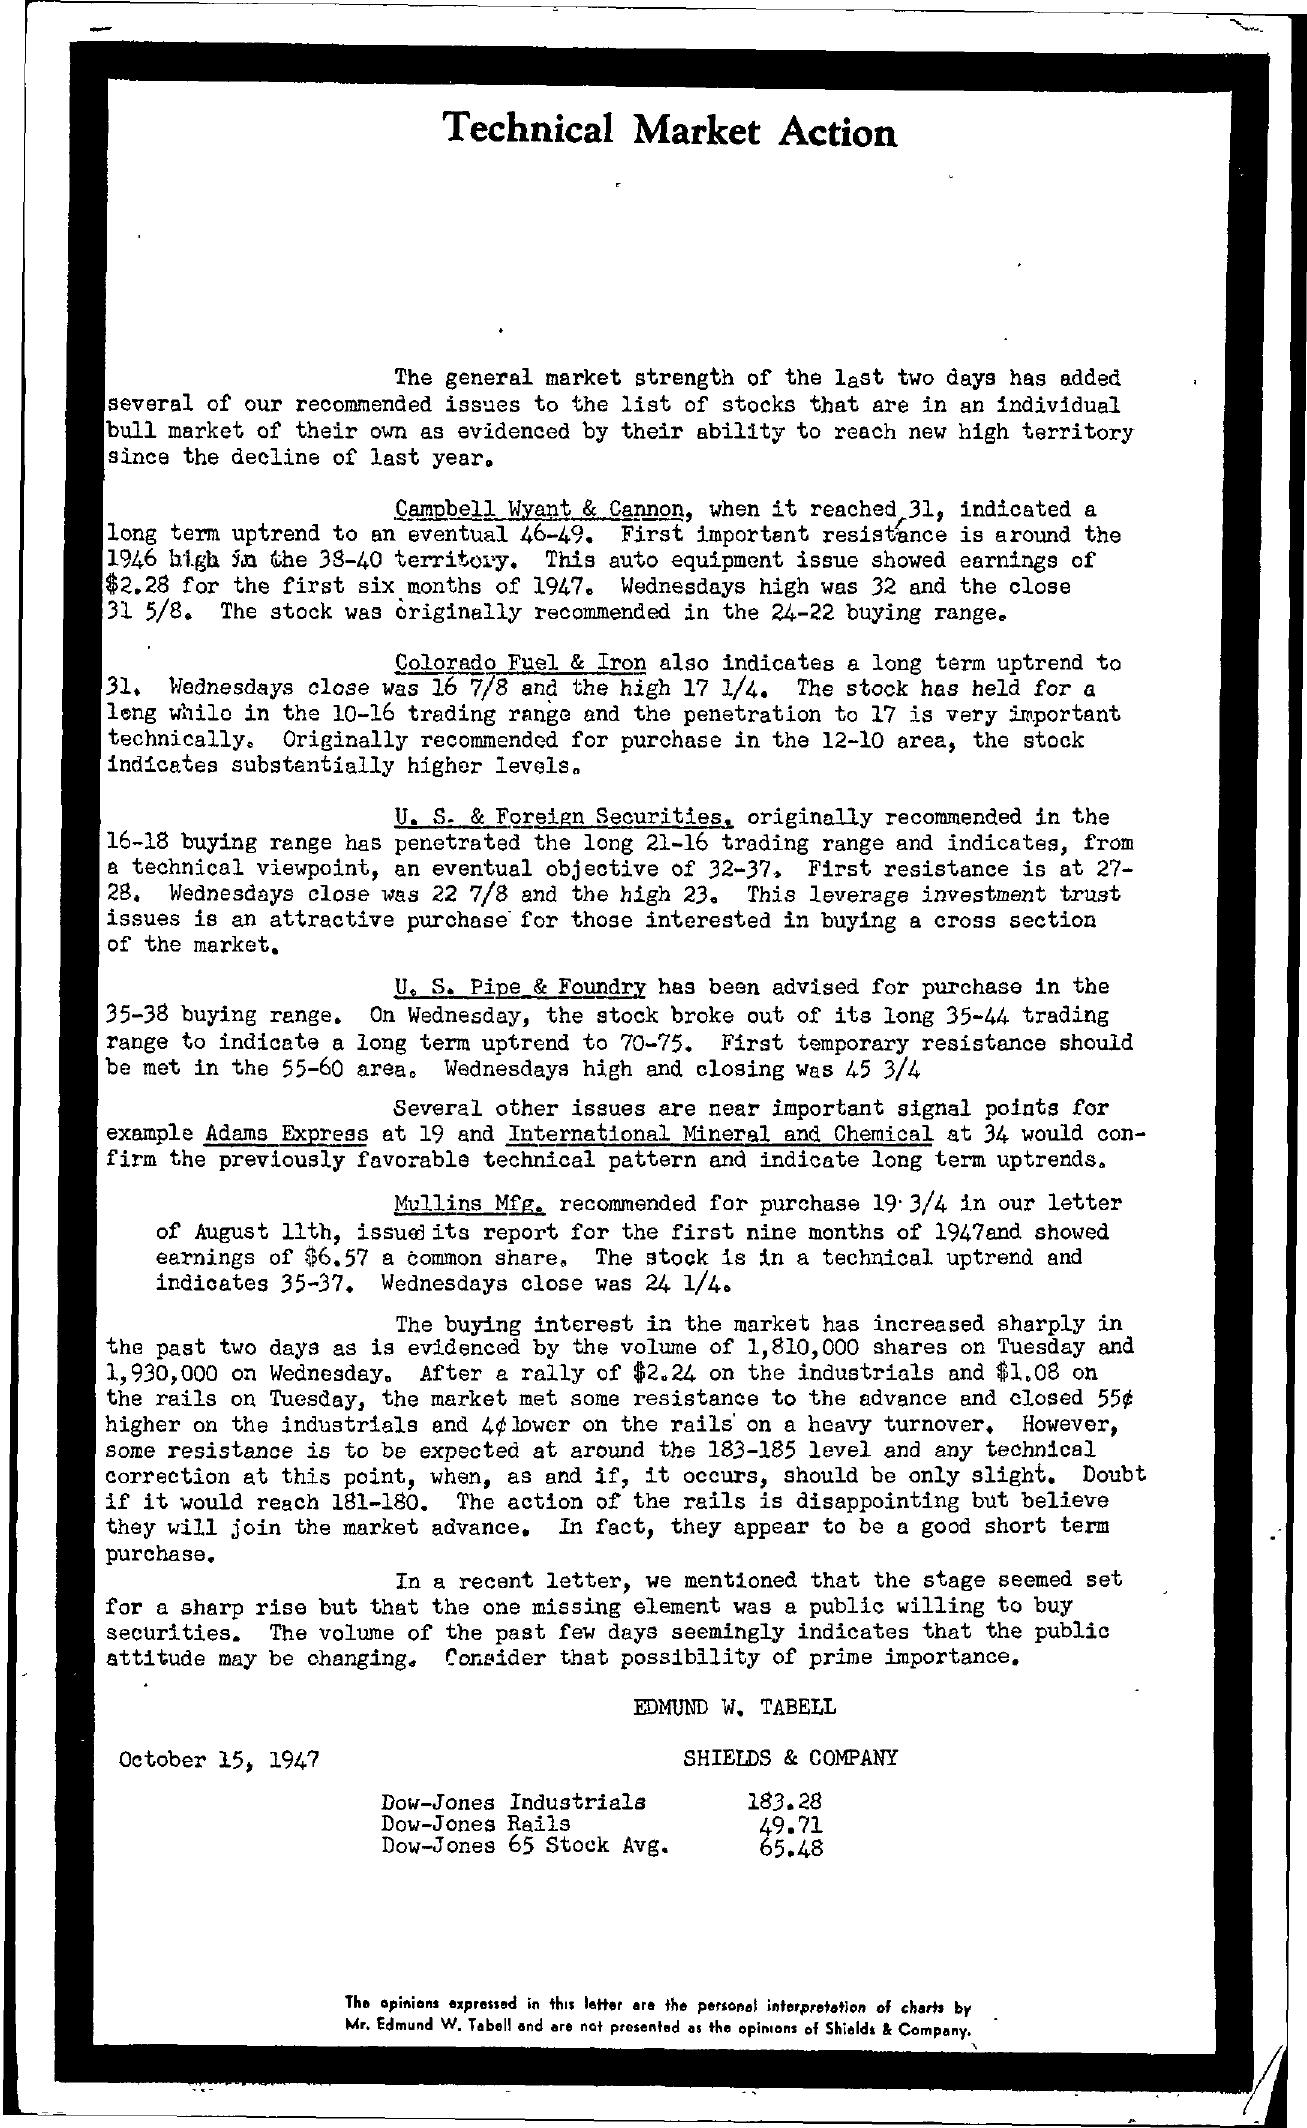 Tabell's Market Letter - October 15, 1947